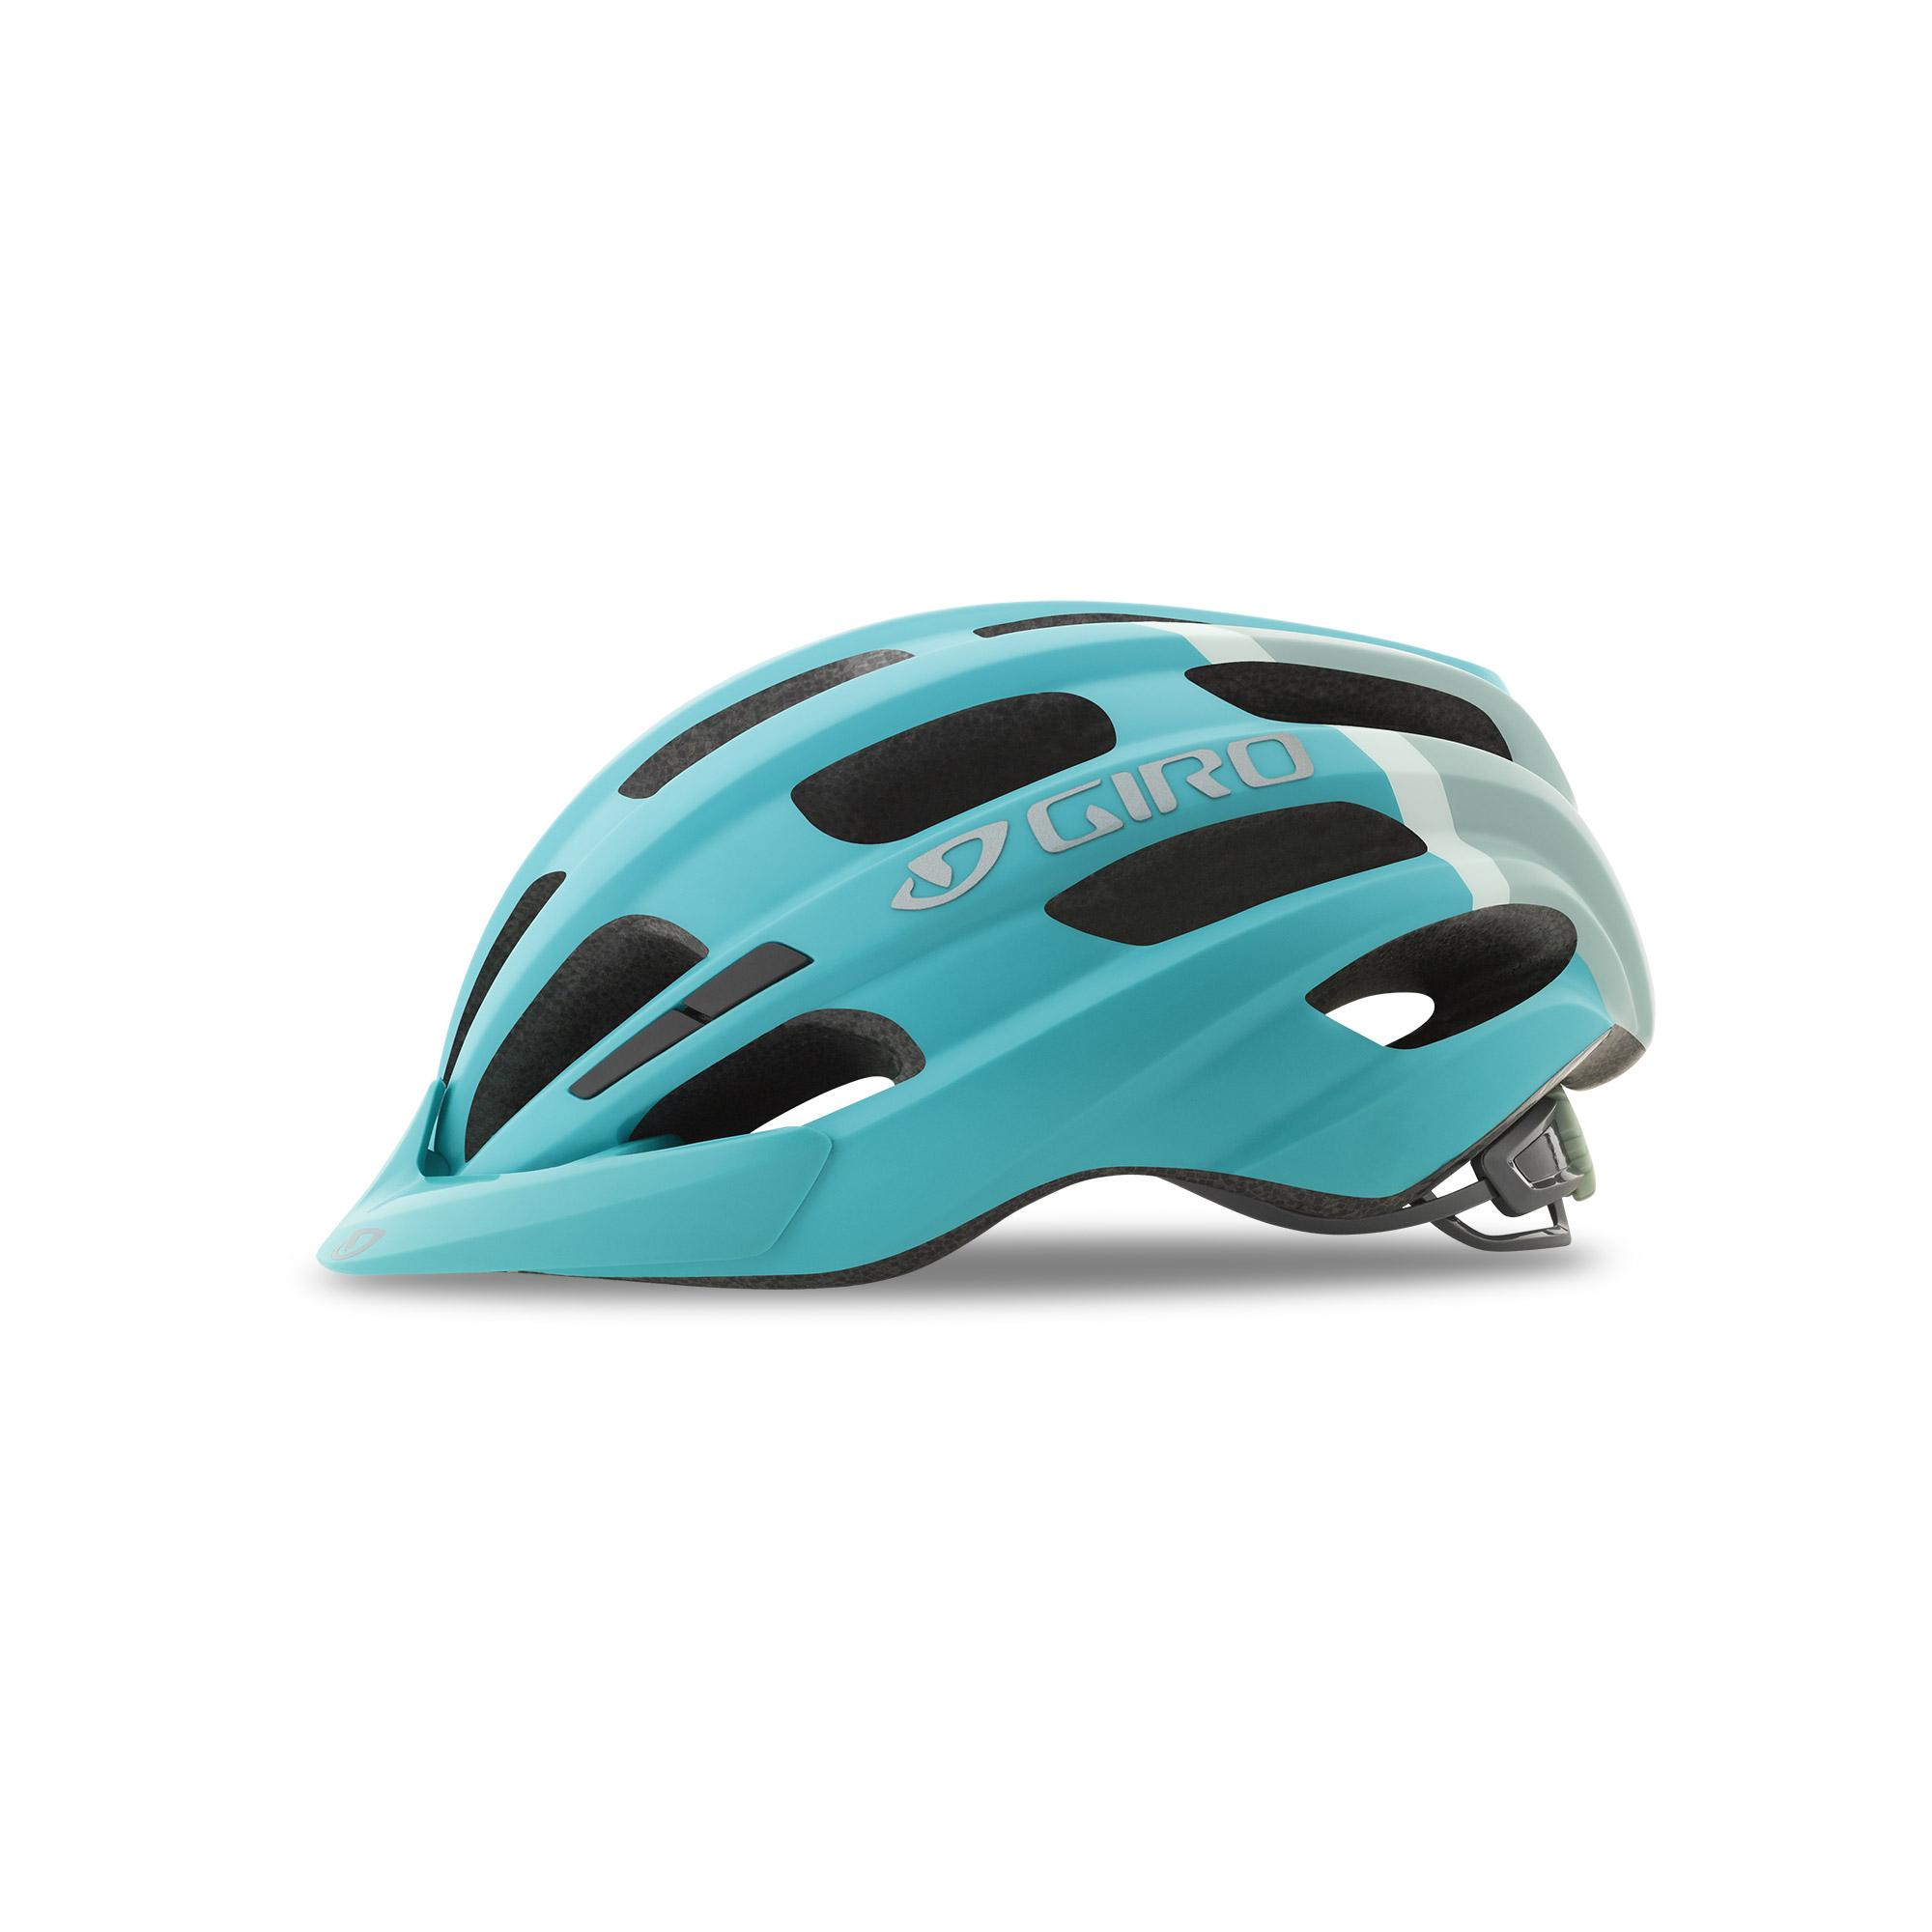 Giro animas adult cycling helmet, pokeporn story live